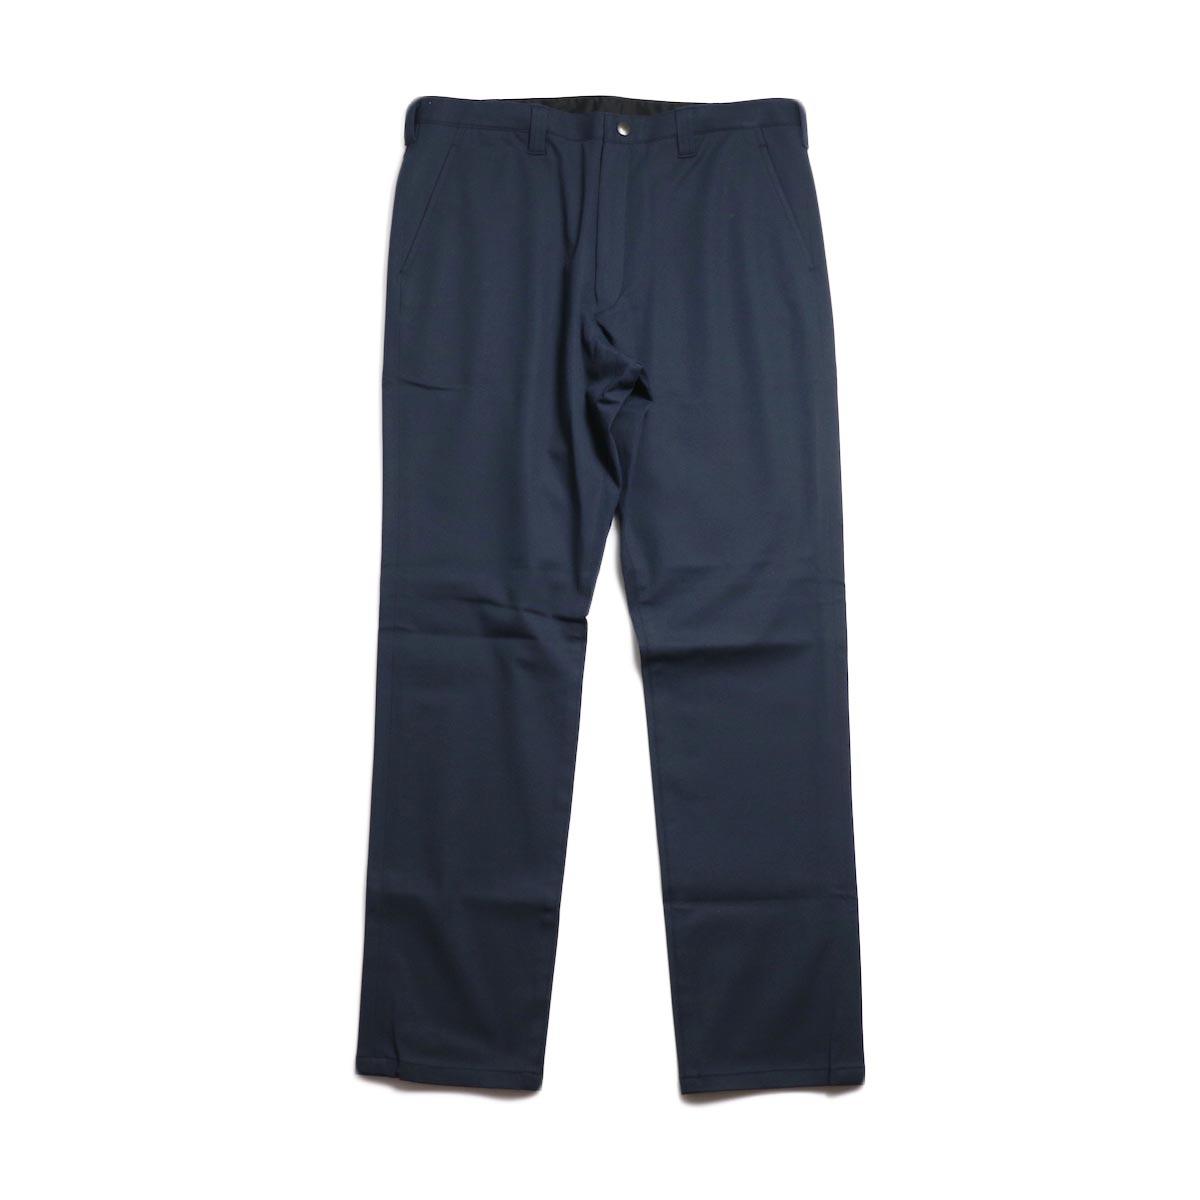 N.HOOLYWOOD / 291-CP04-018-peg Stretch Chino Pant (Navy)